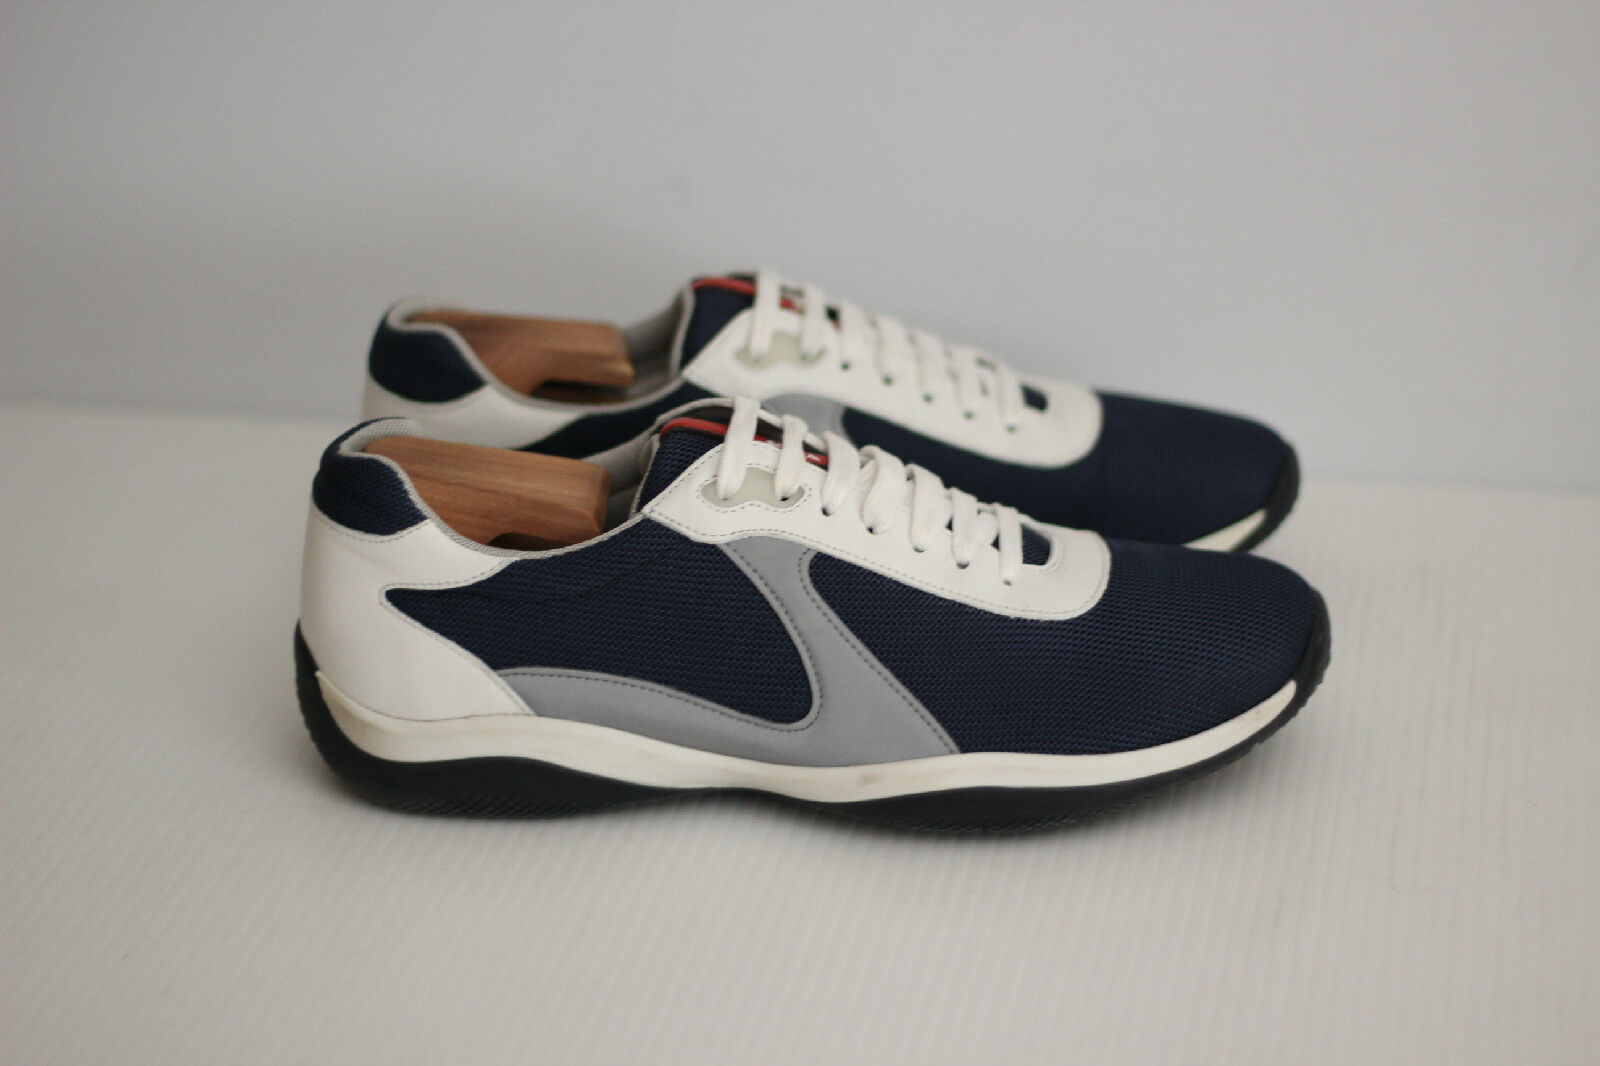 Prada Americas Cup Mesh Linea Rossa scarpe da ginnastica- 8.5US   7.5Navy blu  (X81)